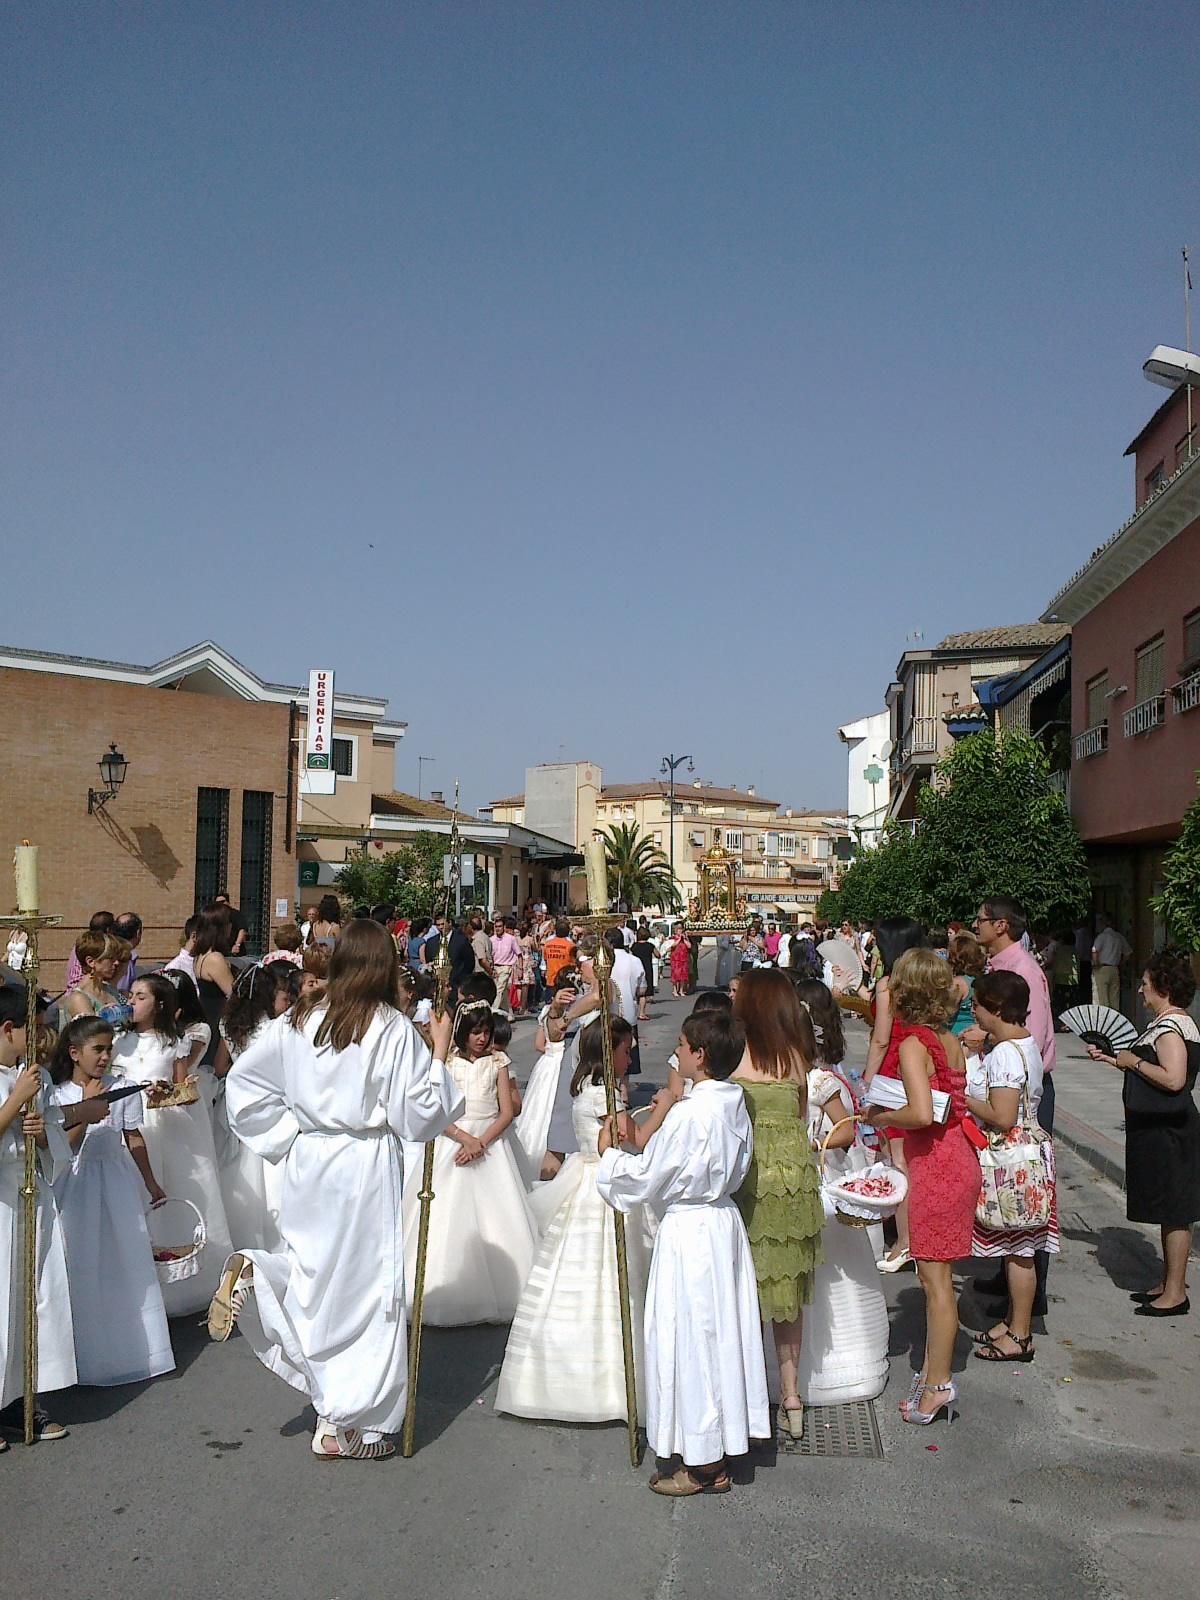 Proteccion civil atarfe procesi n del corpus christi en - Santa ana atarfe ...